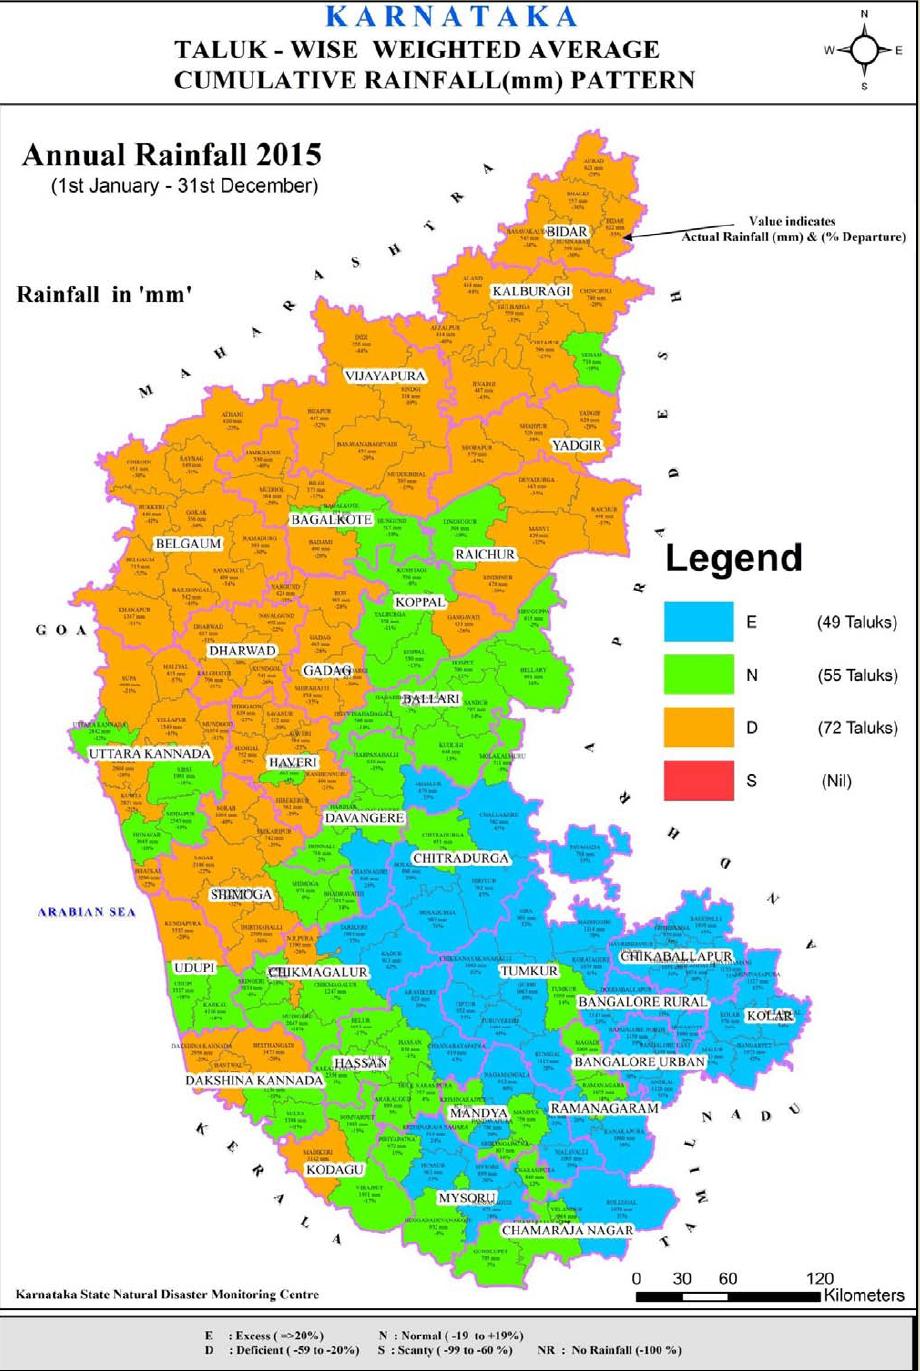 karnatakatalukwiserainfallmap2015.png (920×1371